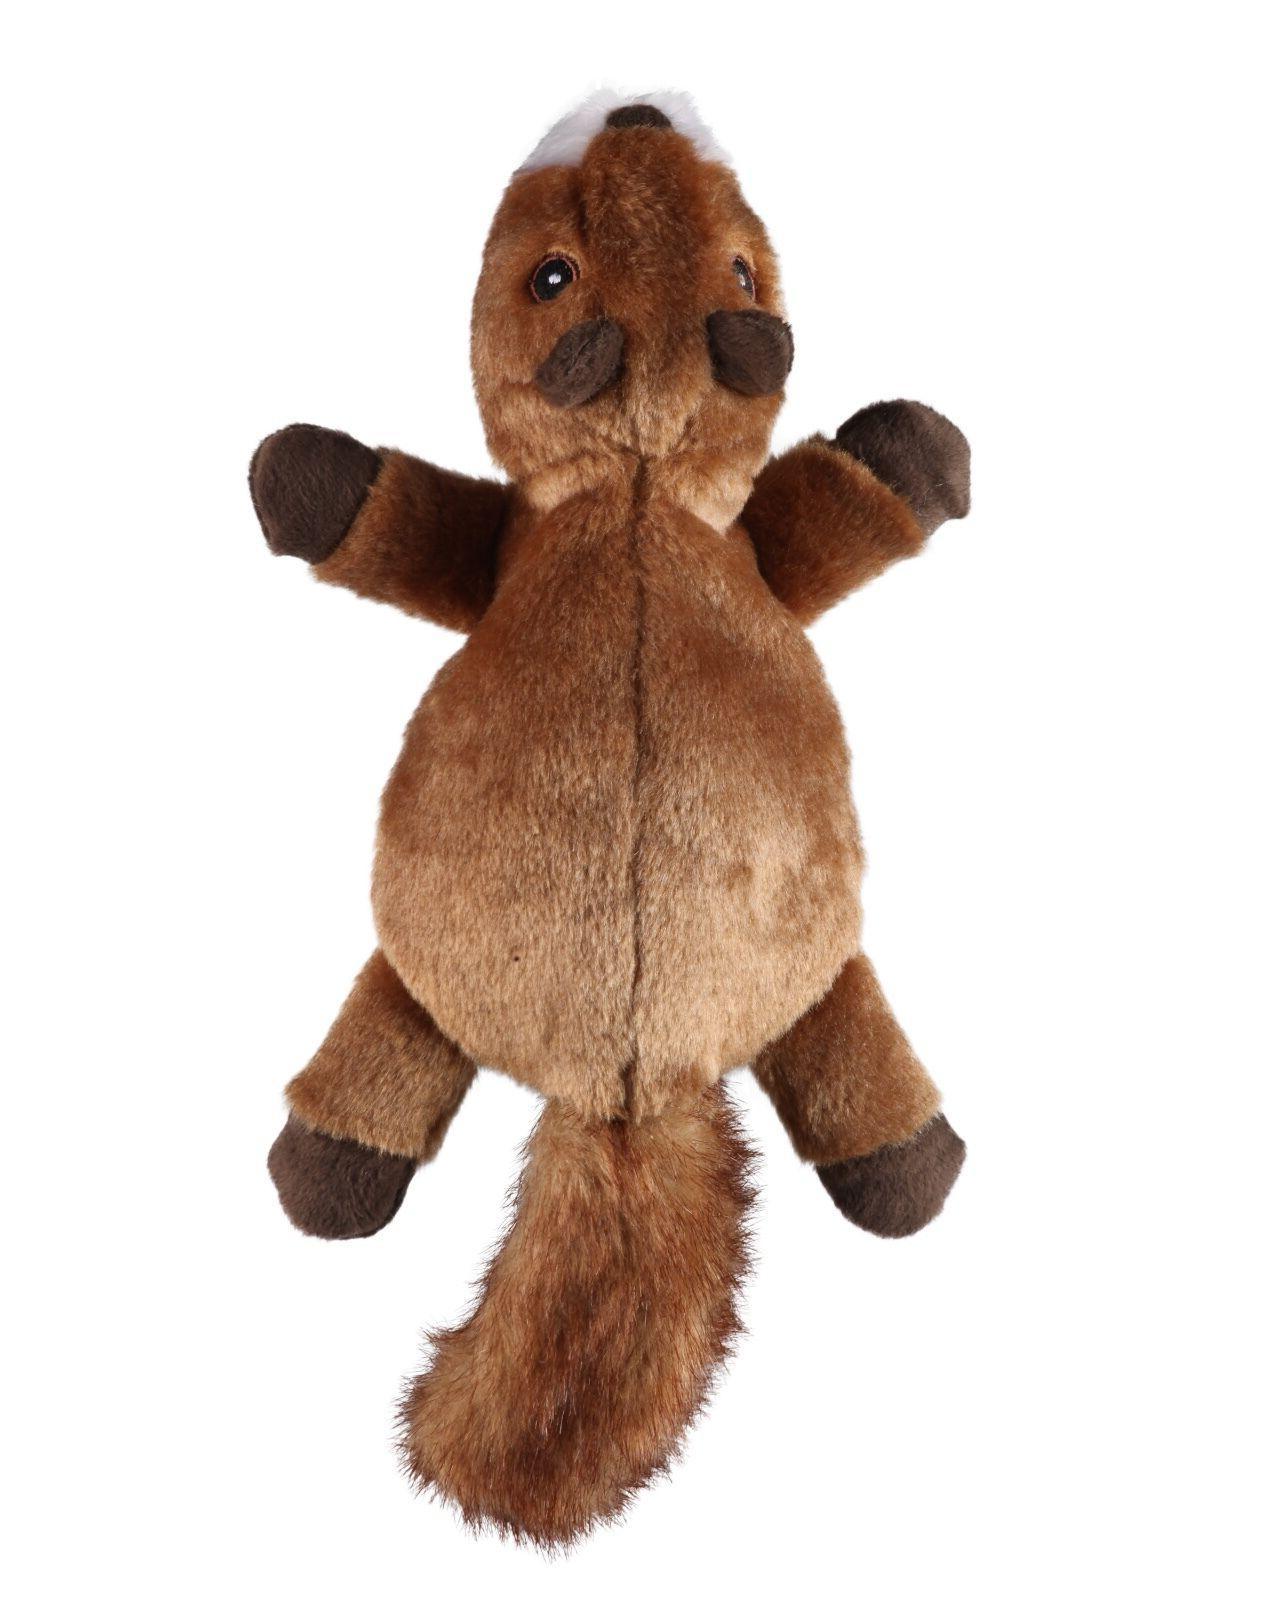 GoDog Flatz Dog Toys, Choose from: Skunk, Squirrel, Opossum